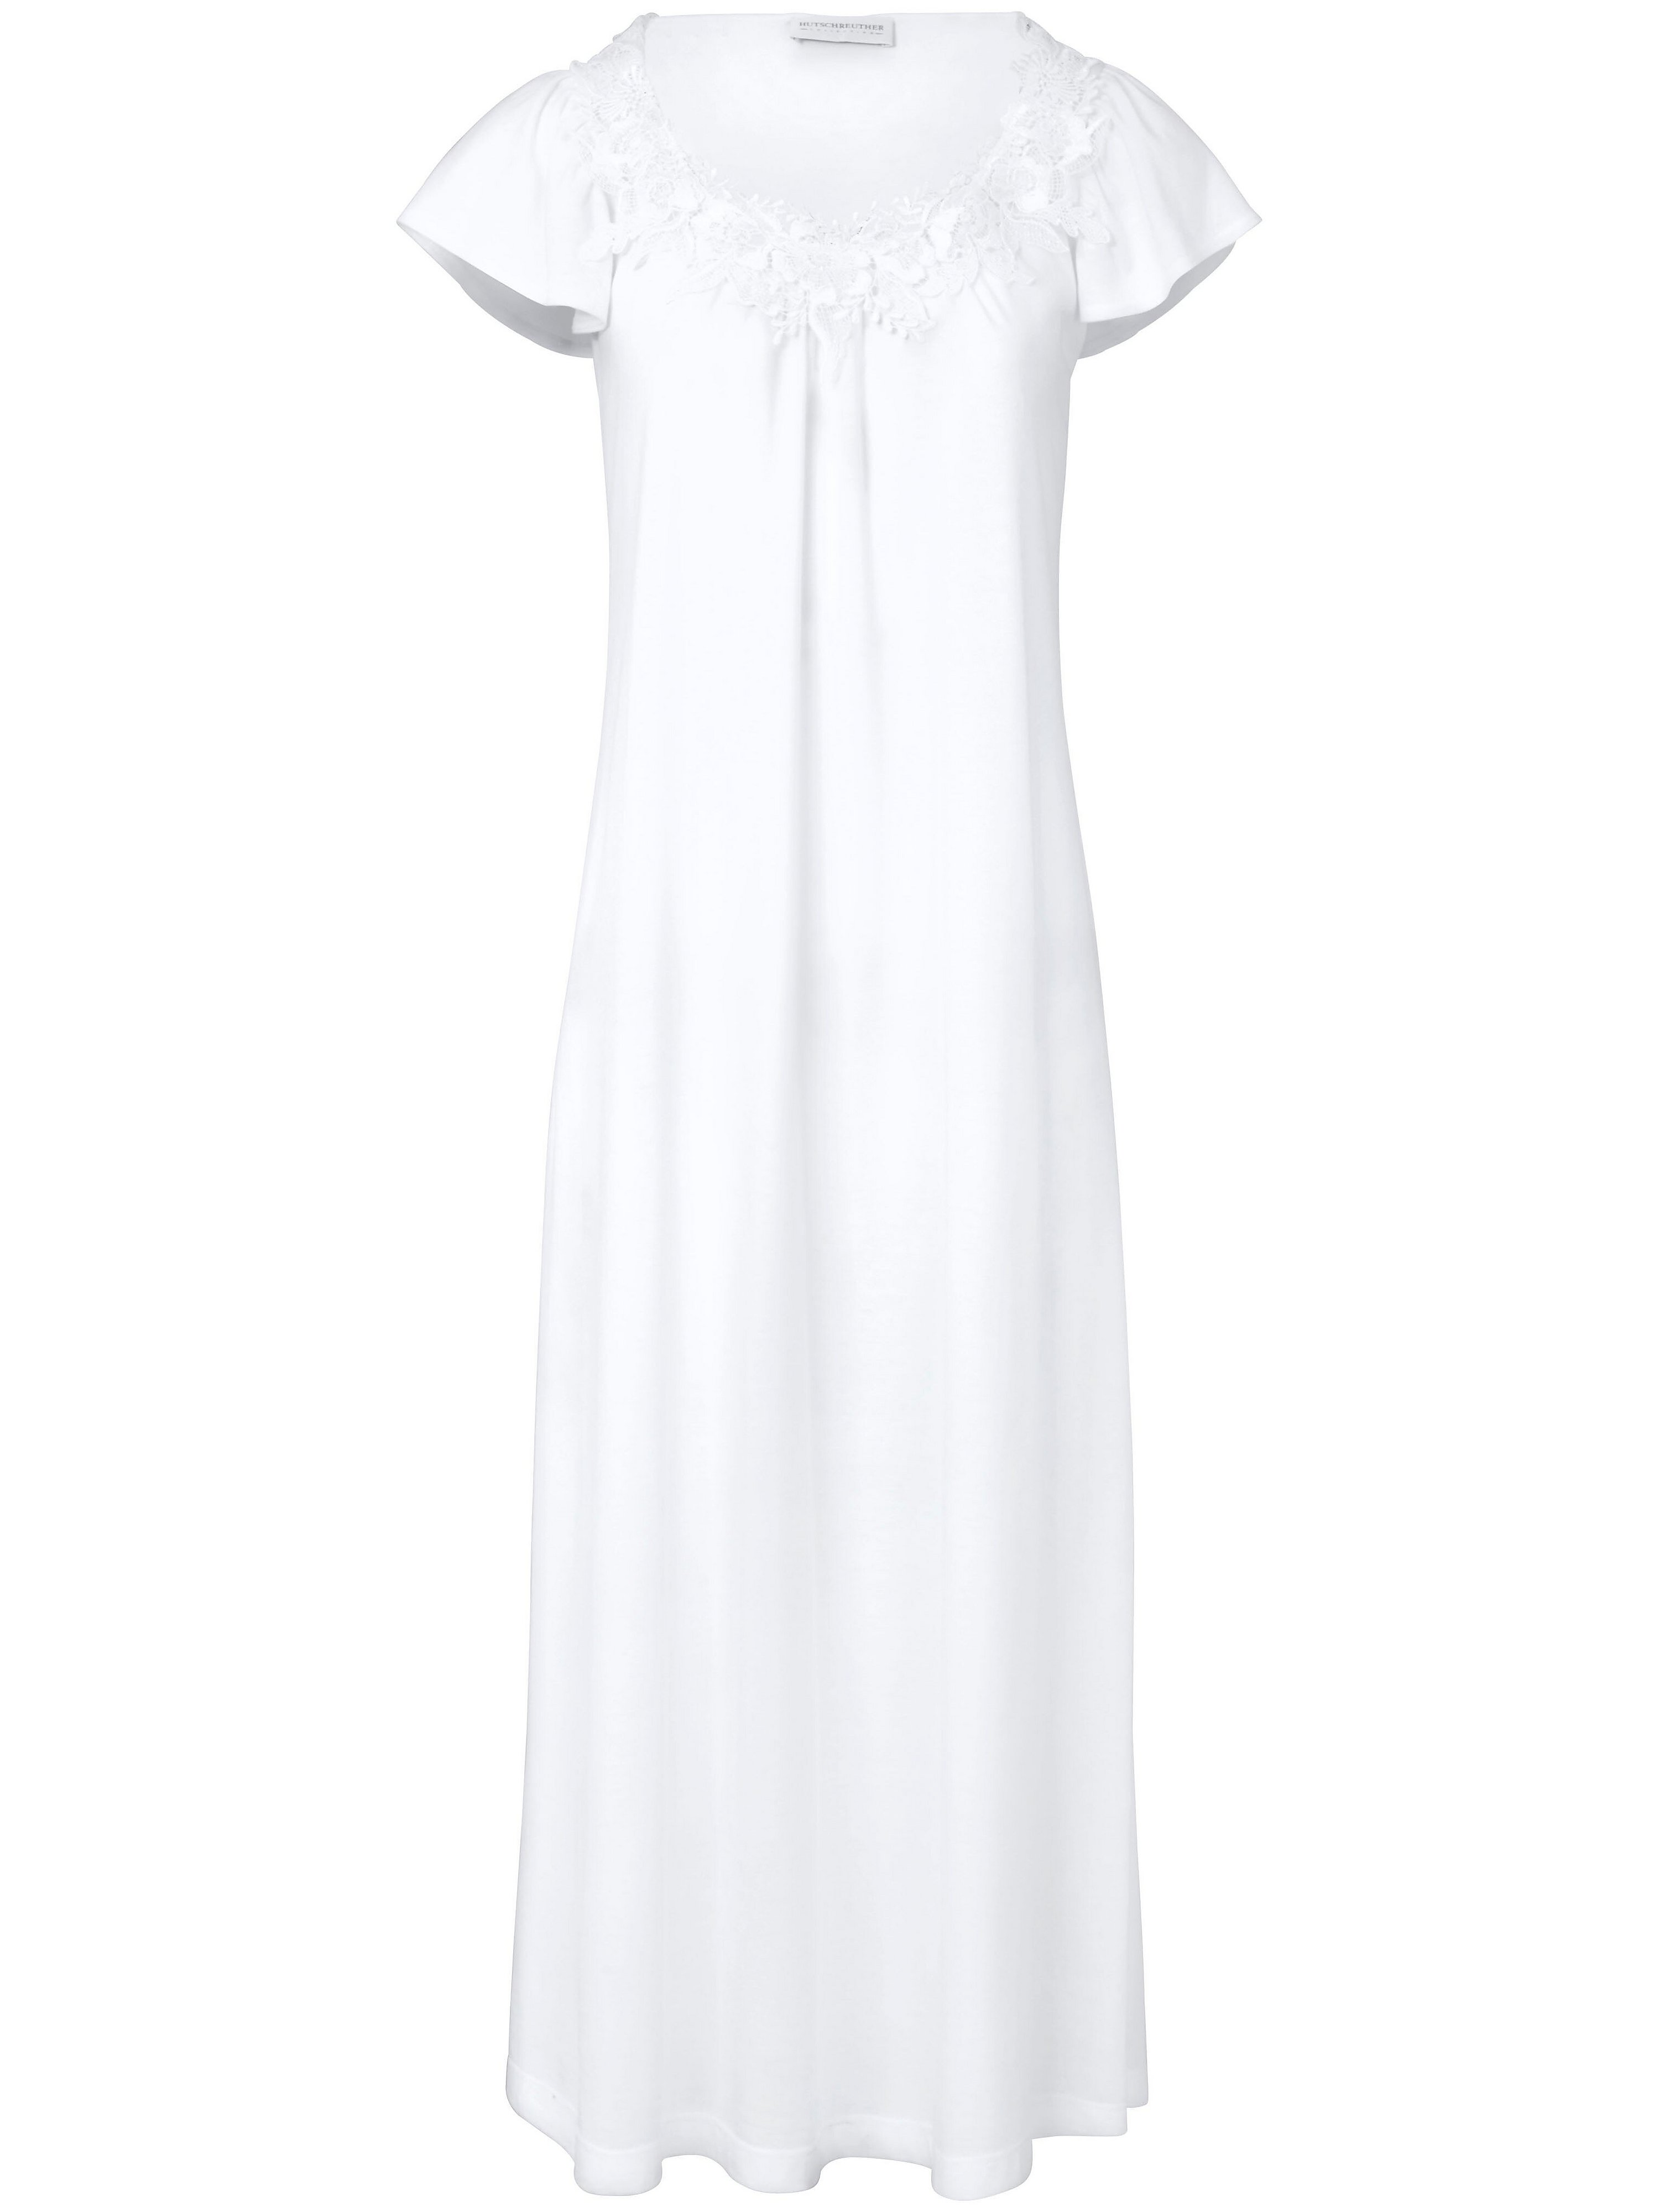 La chemise nuit unie, manches courtes  Hutschreuther blanc taille 54